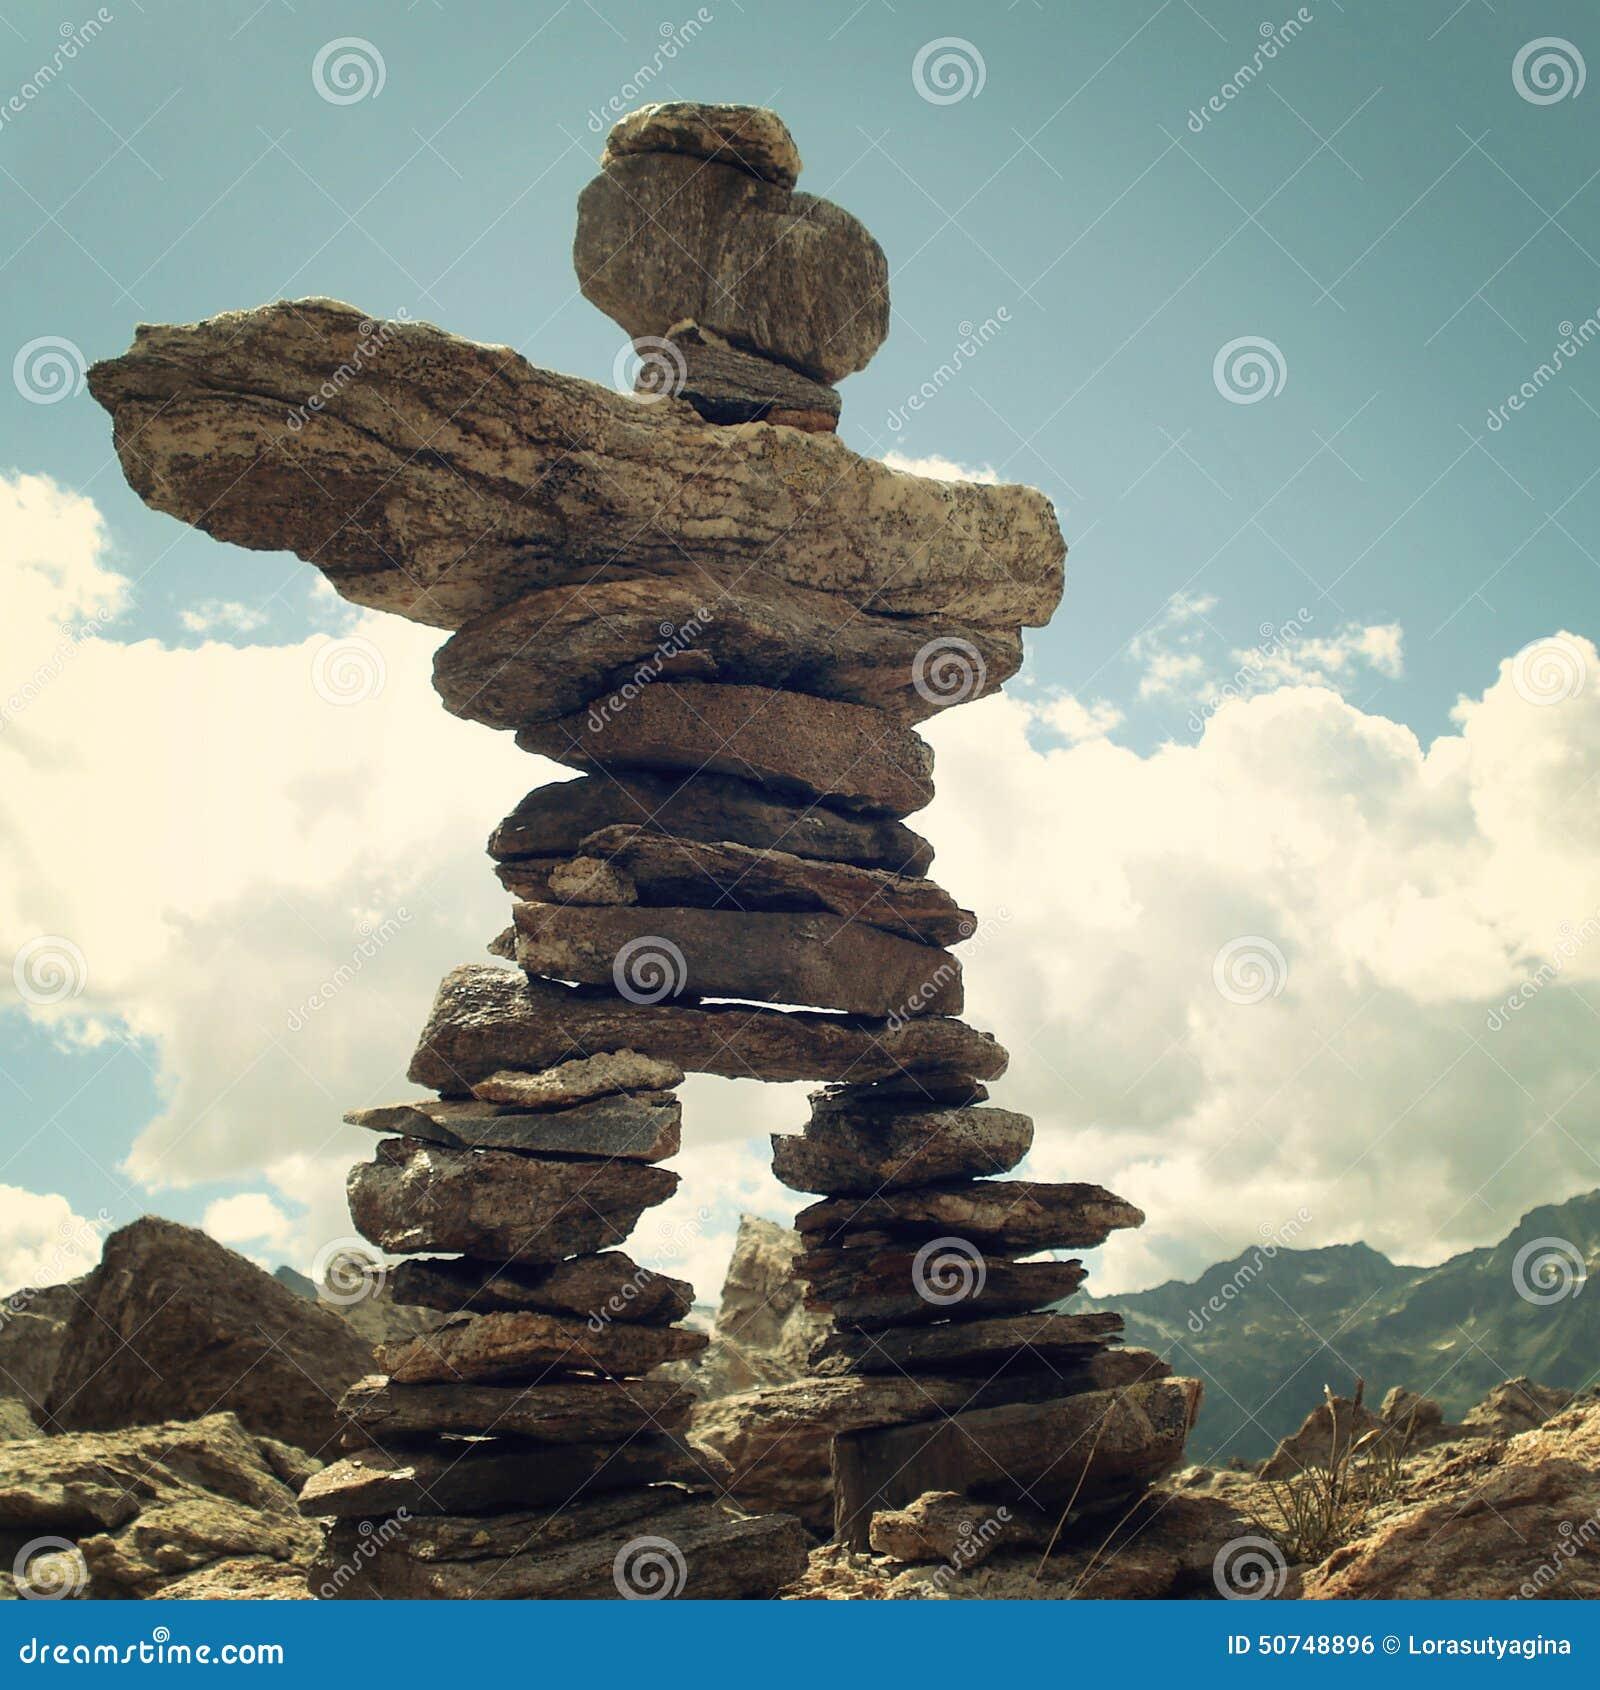 Stones Like Stones Essen like pyramid trail sign caucasus mountains vintage e stock photo image 50748896